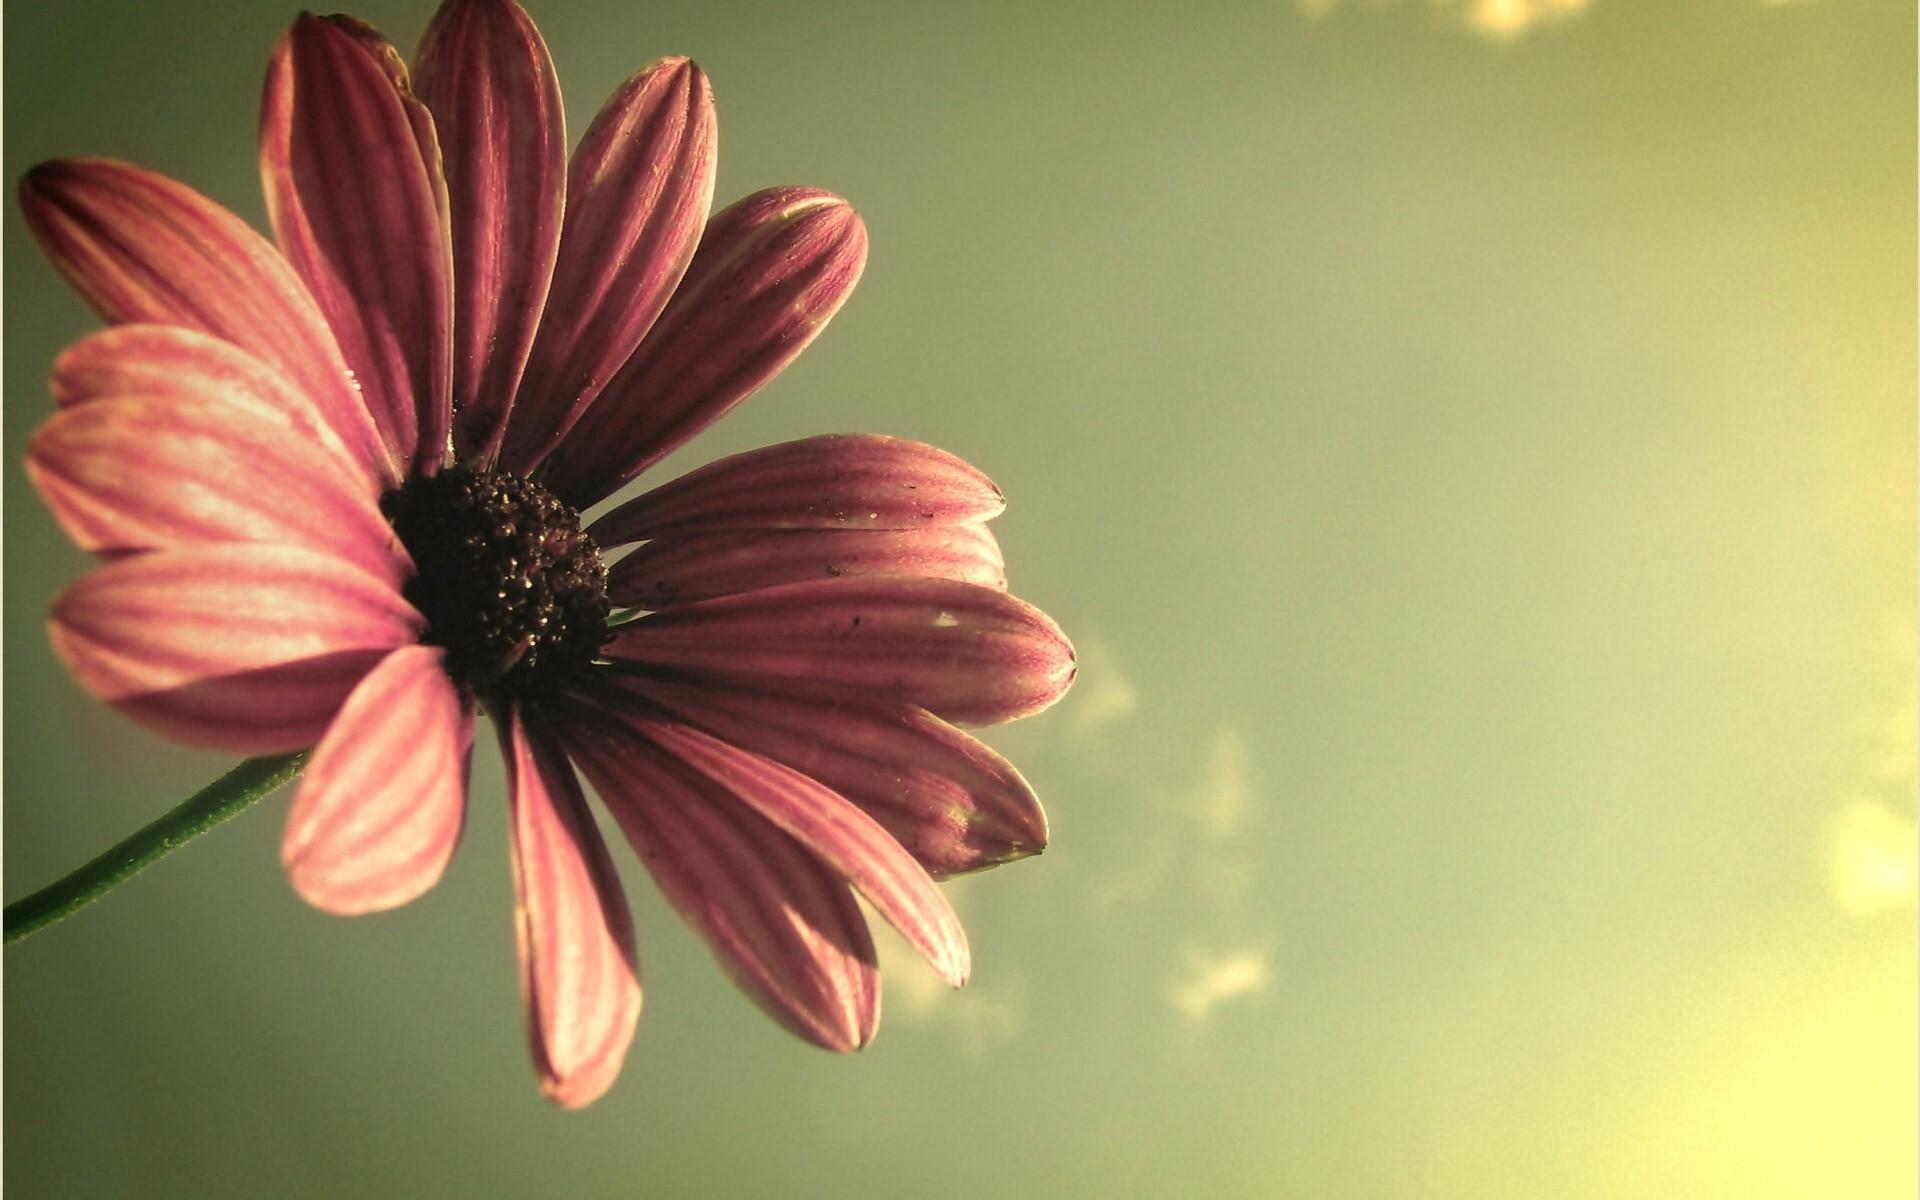 Beautiful Flower HD Image